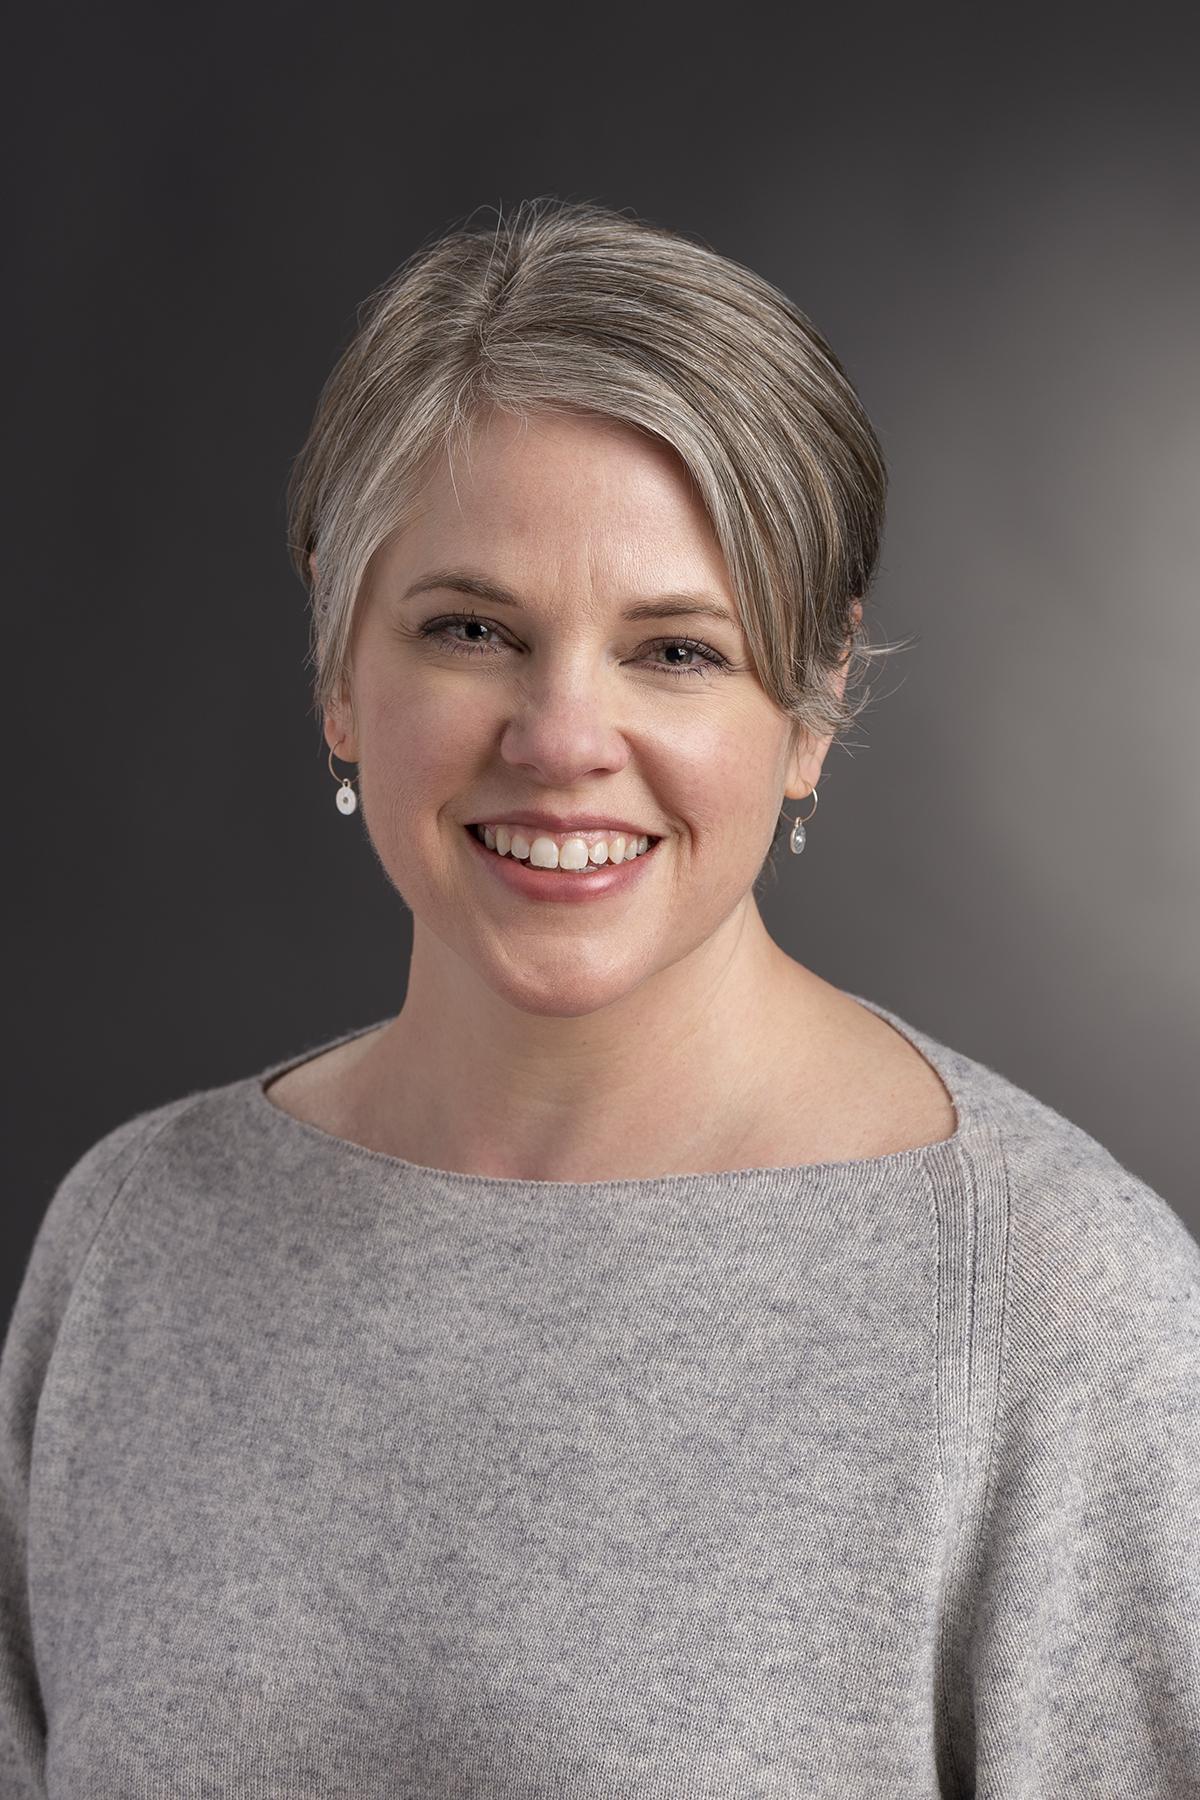 Headshot of Christye Sisson.